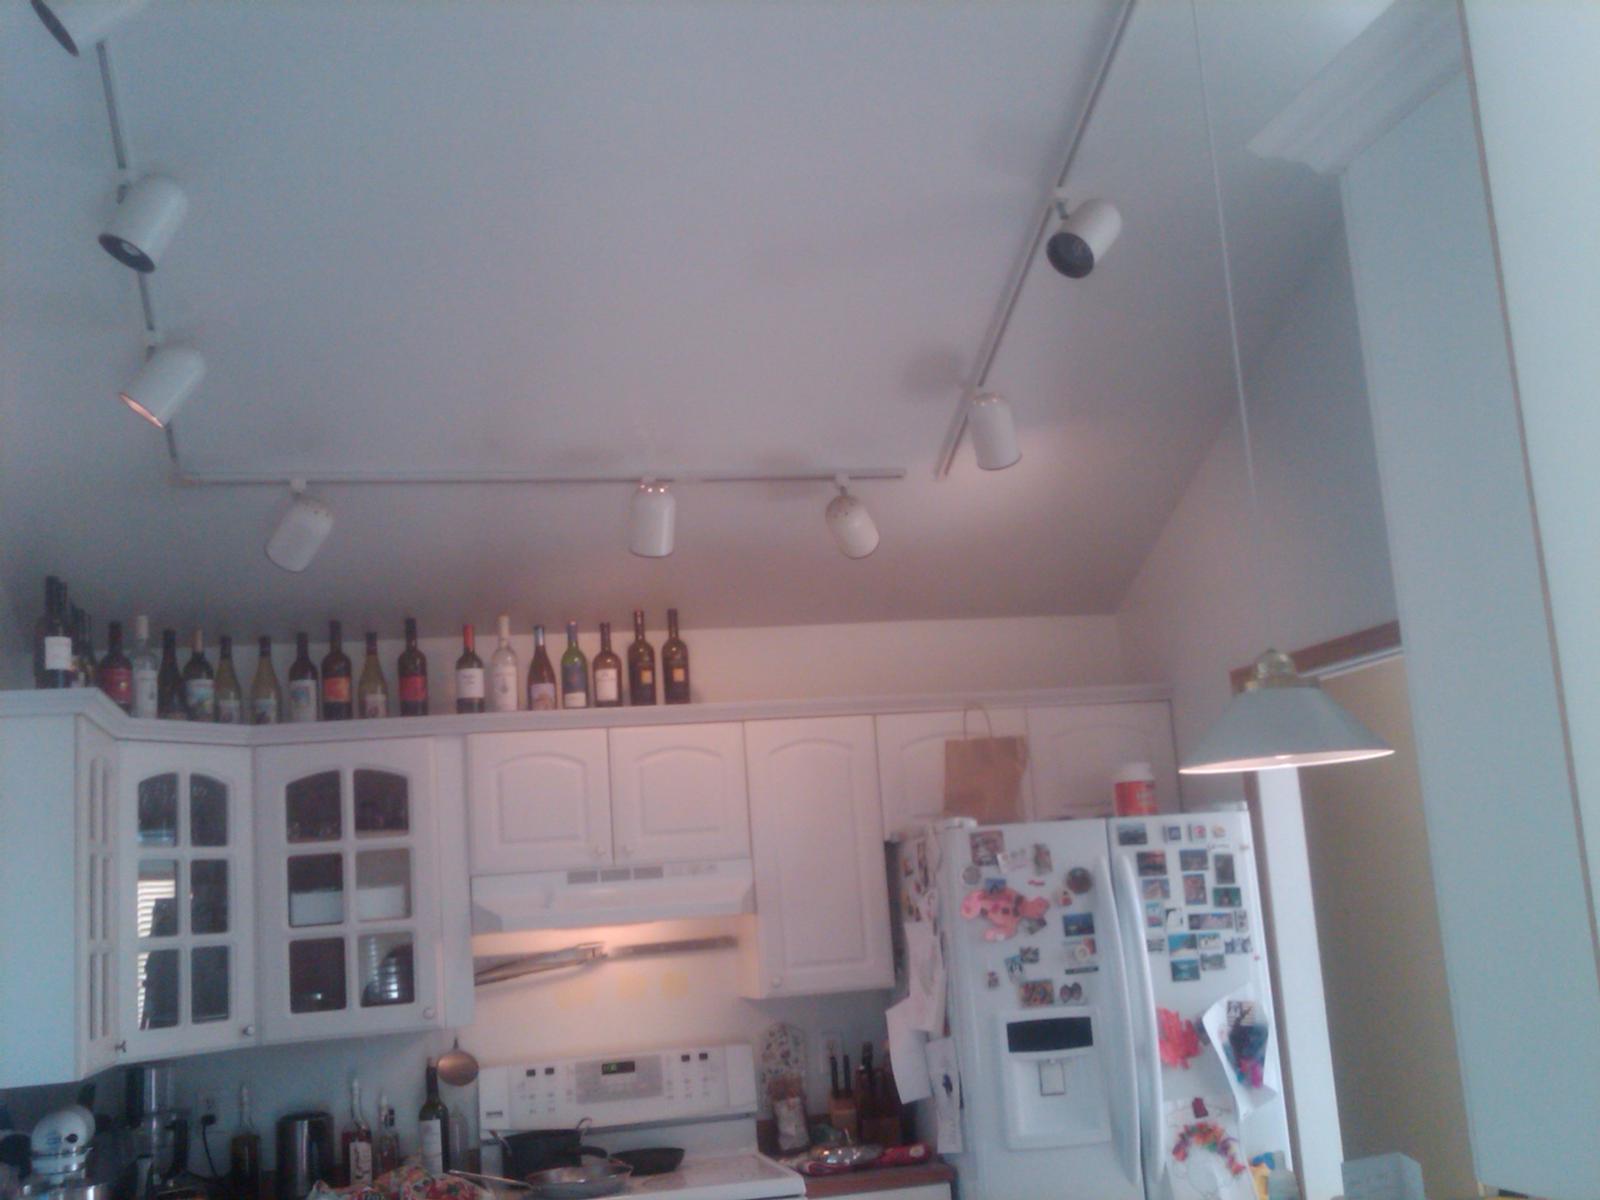 kitchen needs lighting solution im stumped kitchen track lighting Kitchen needs lighting solution and I m stumped